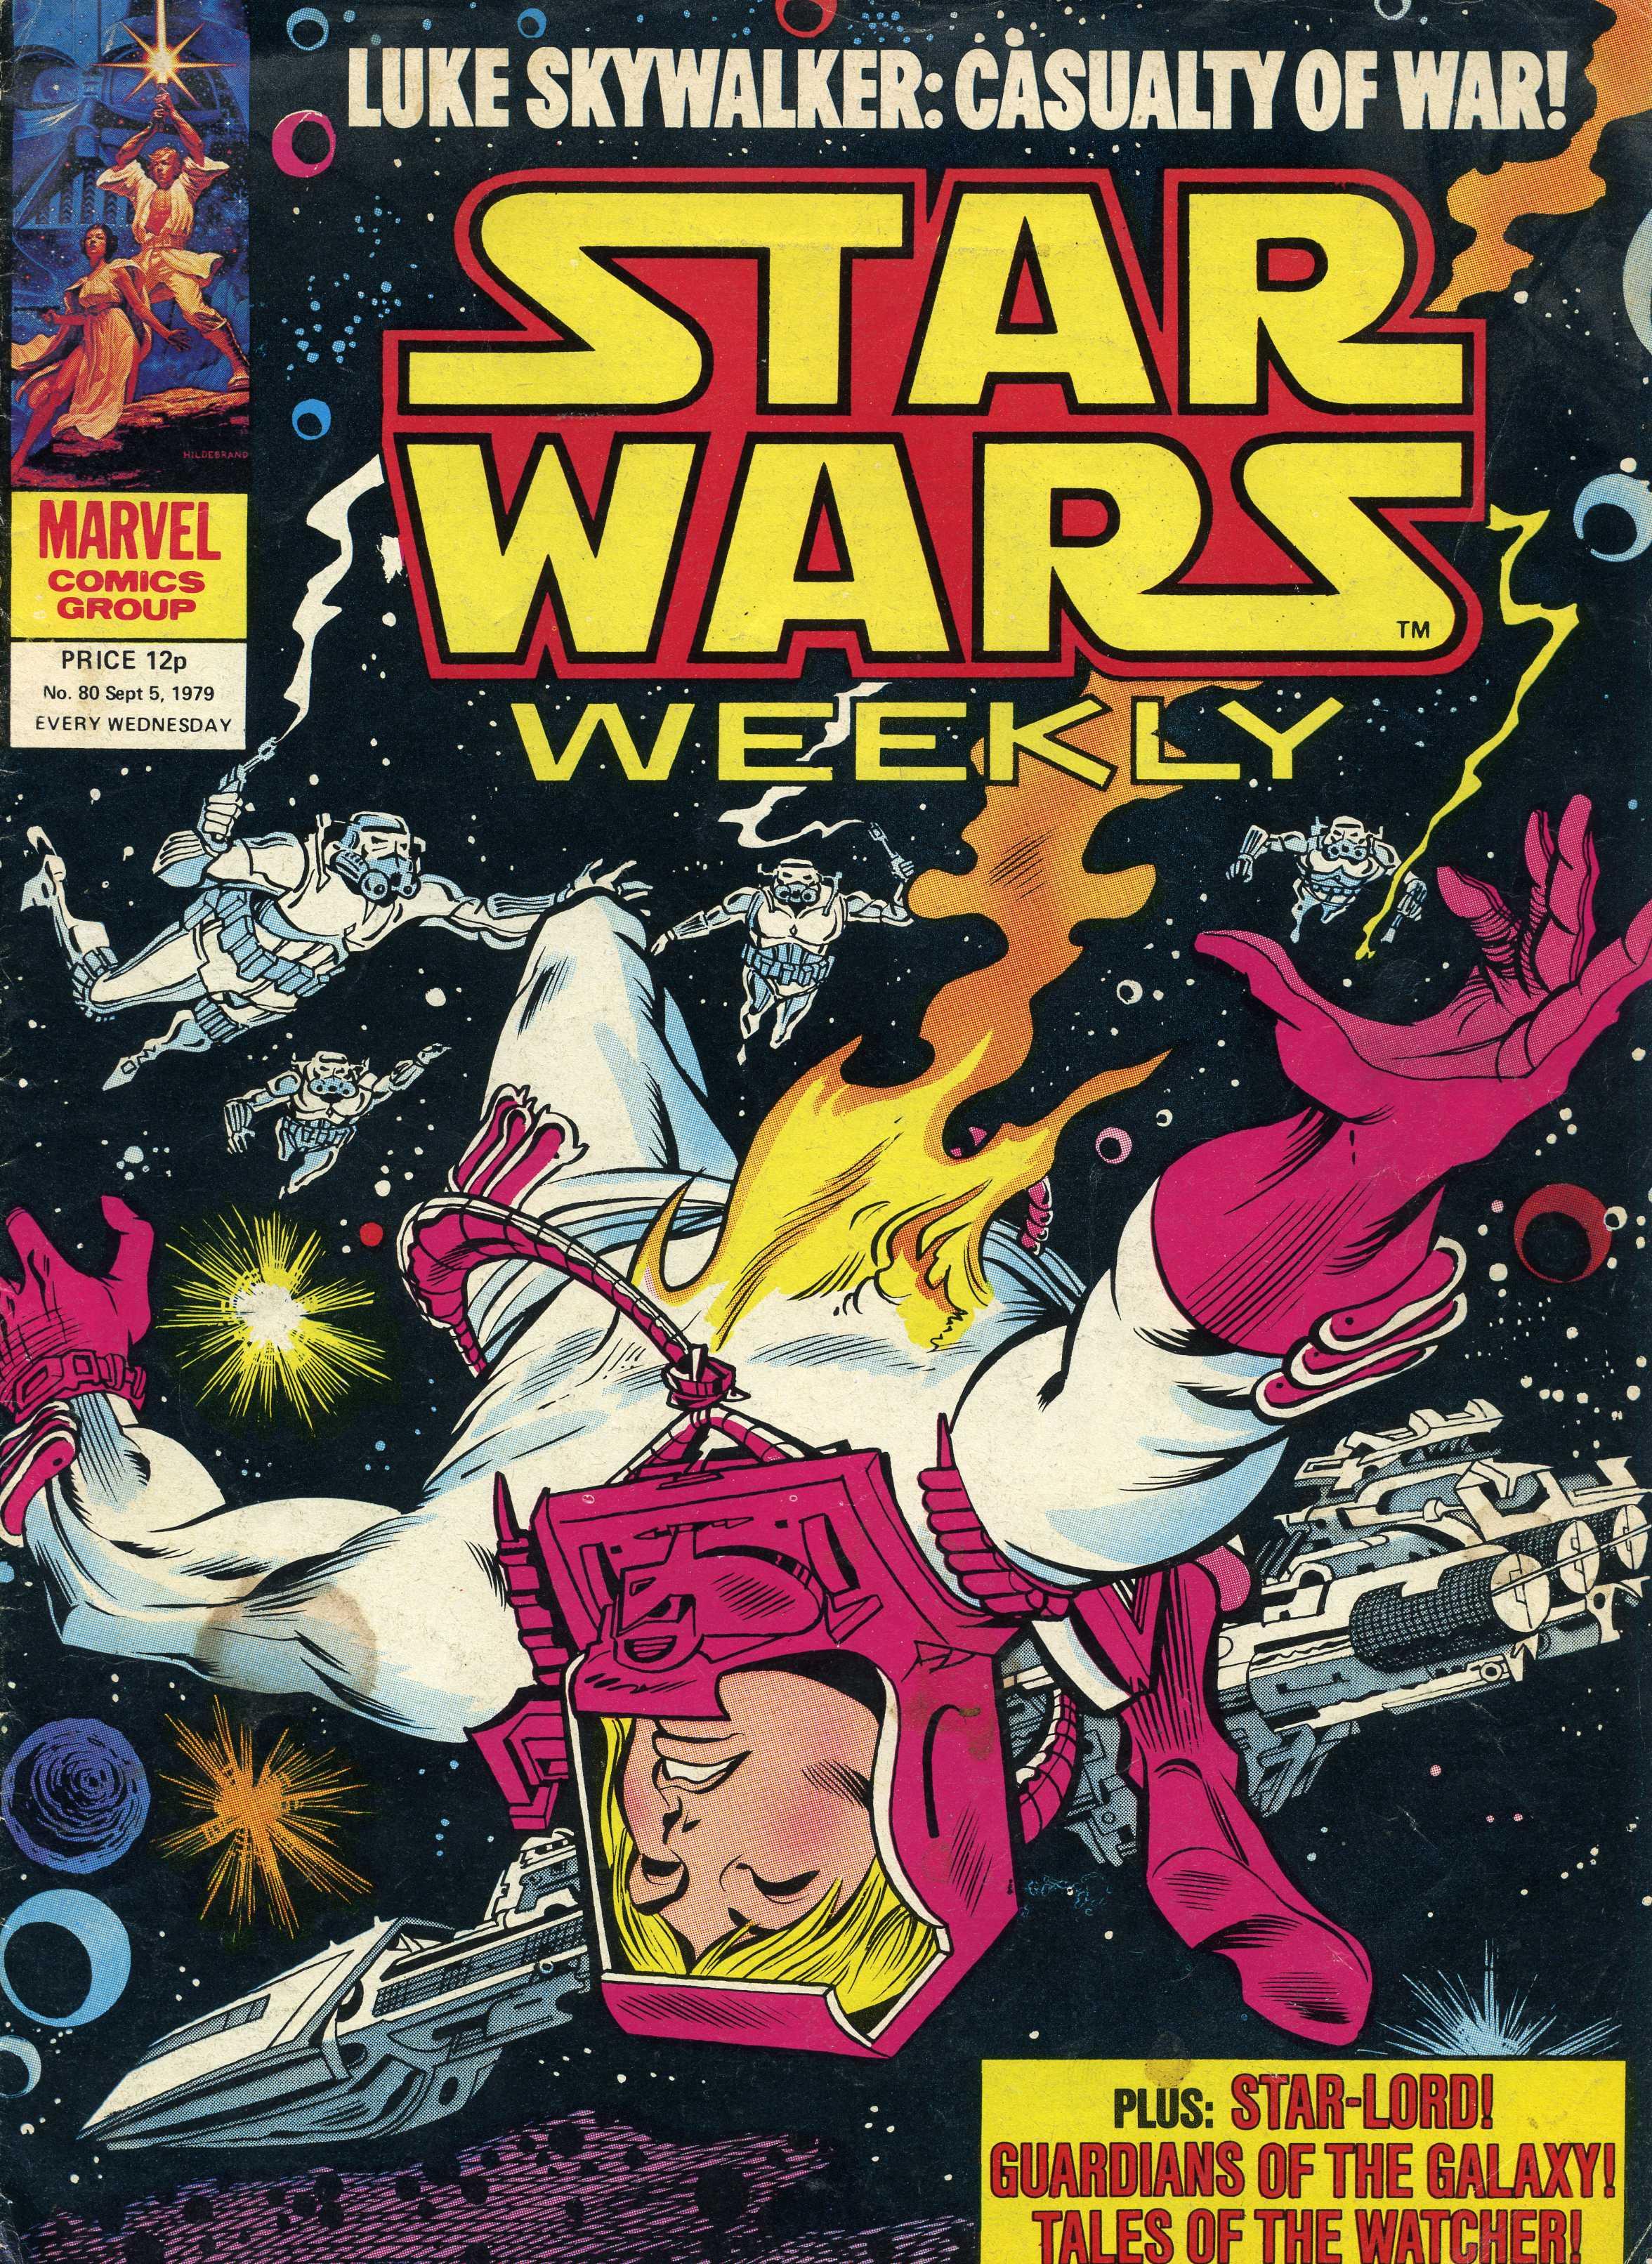 Star Wars Weekly 80